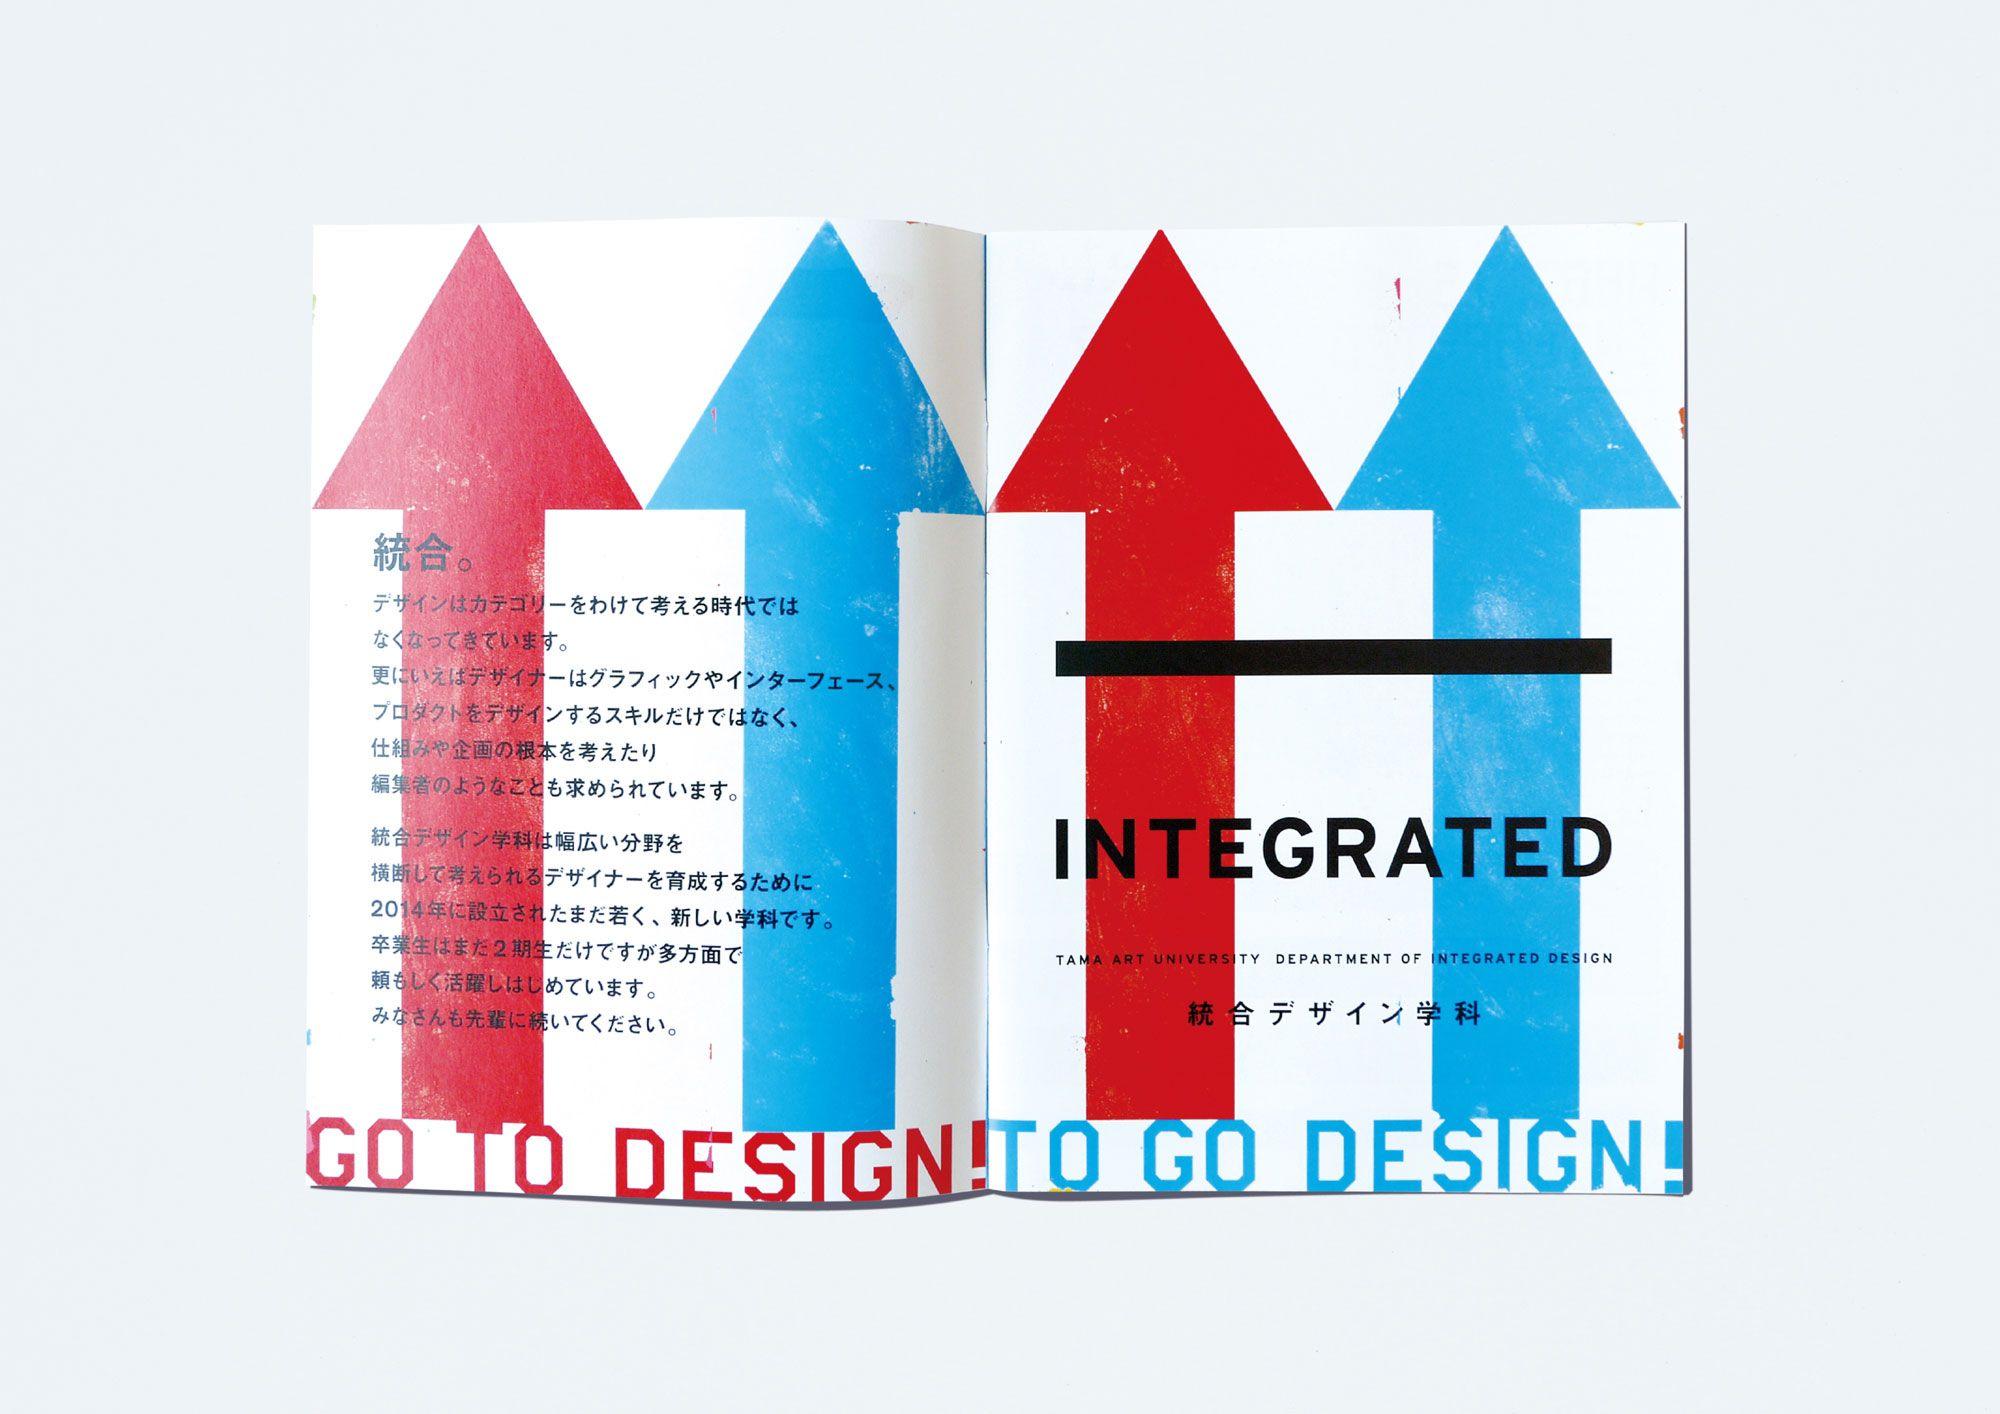 Tama Art University Department Of Integrated Design Open Campus